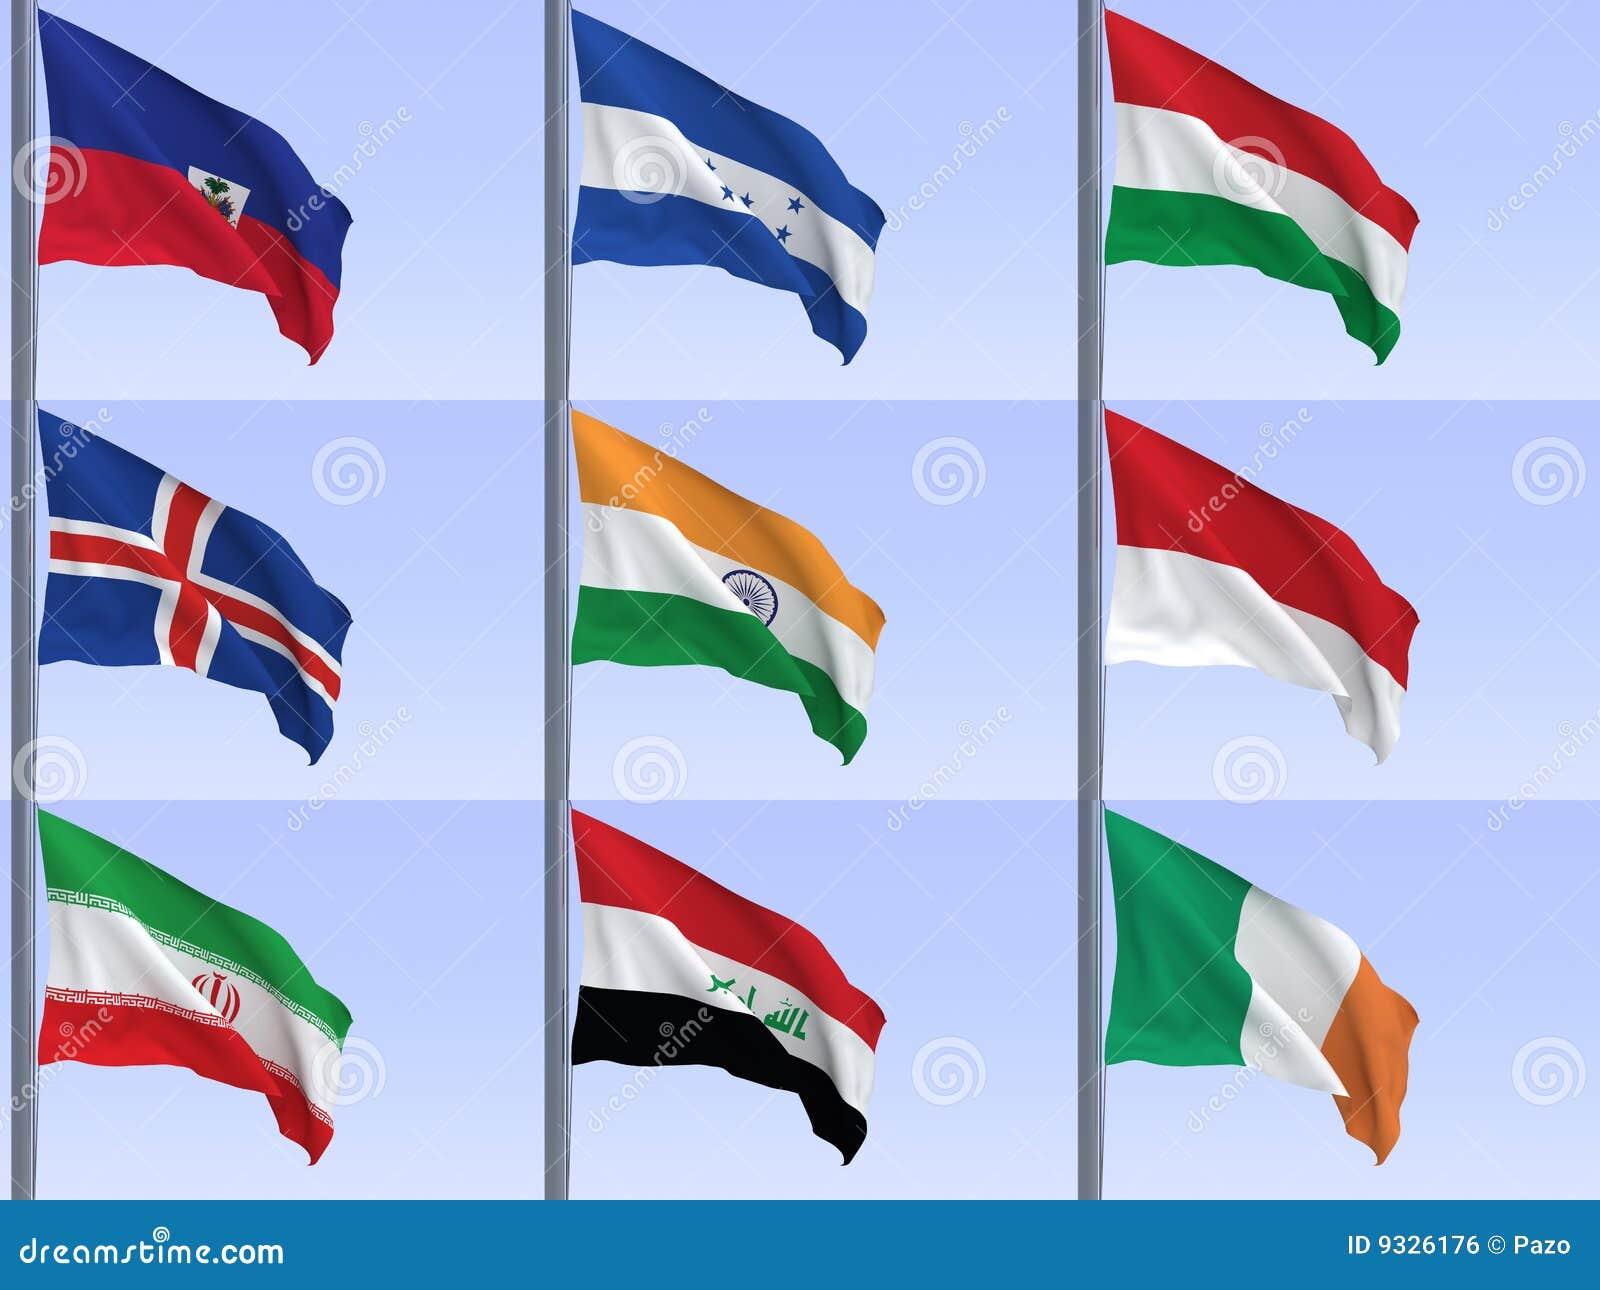 Flags vol12